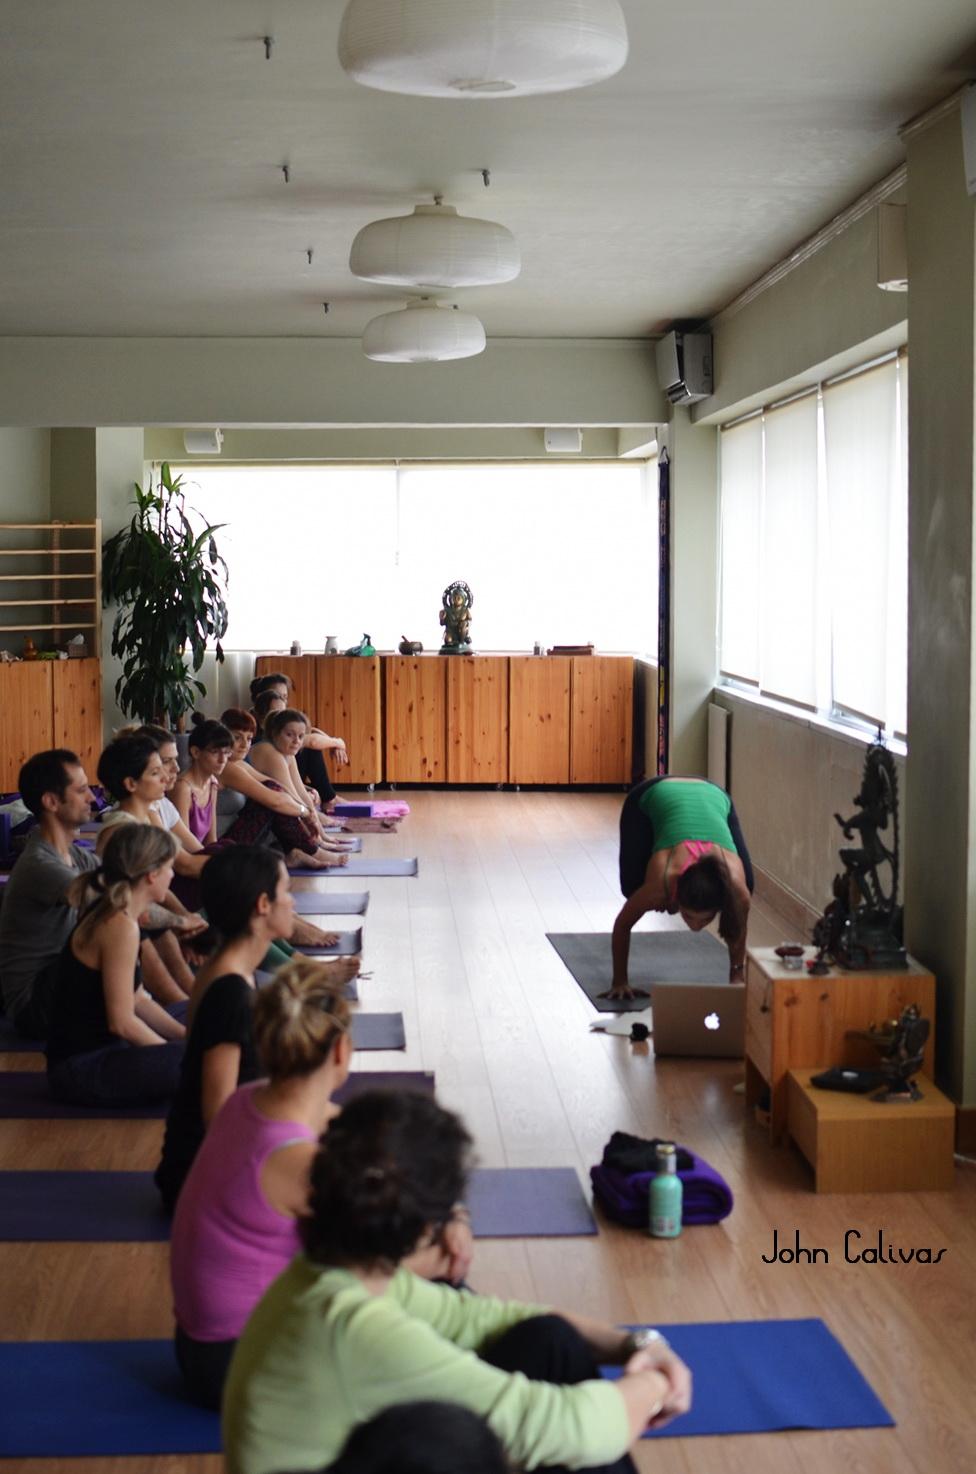 Candace teaching at Bhavana Yoga Studio, Athens, Greece. February 2, 2014